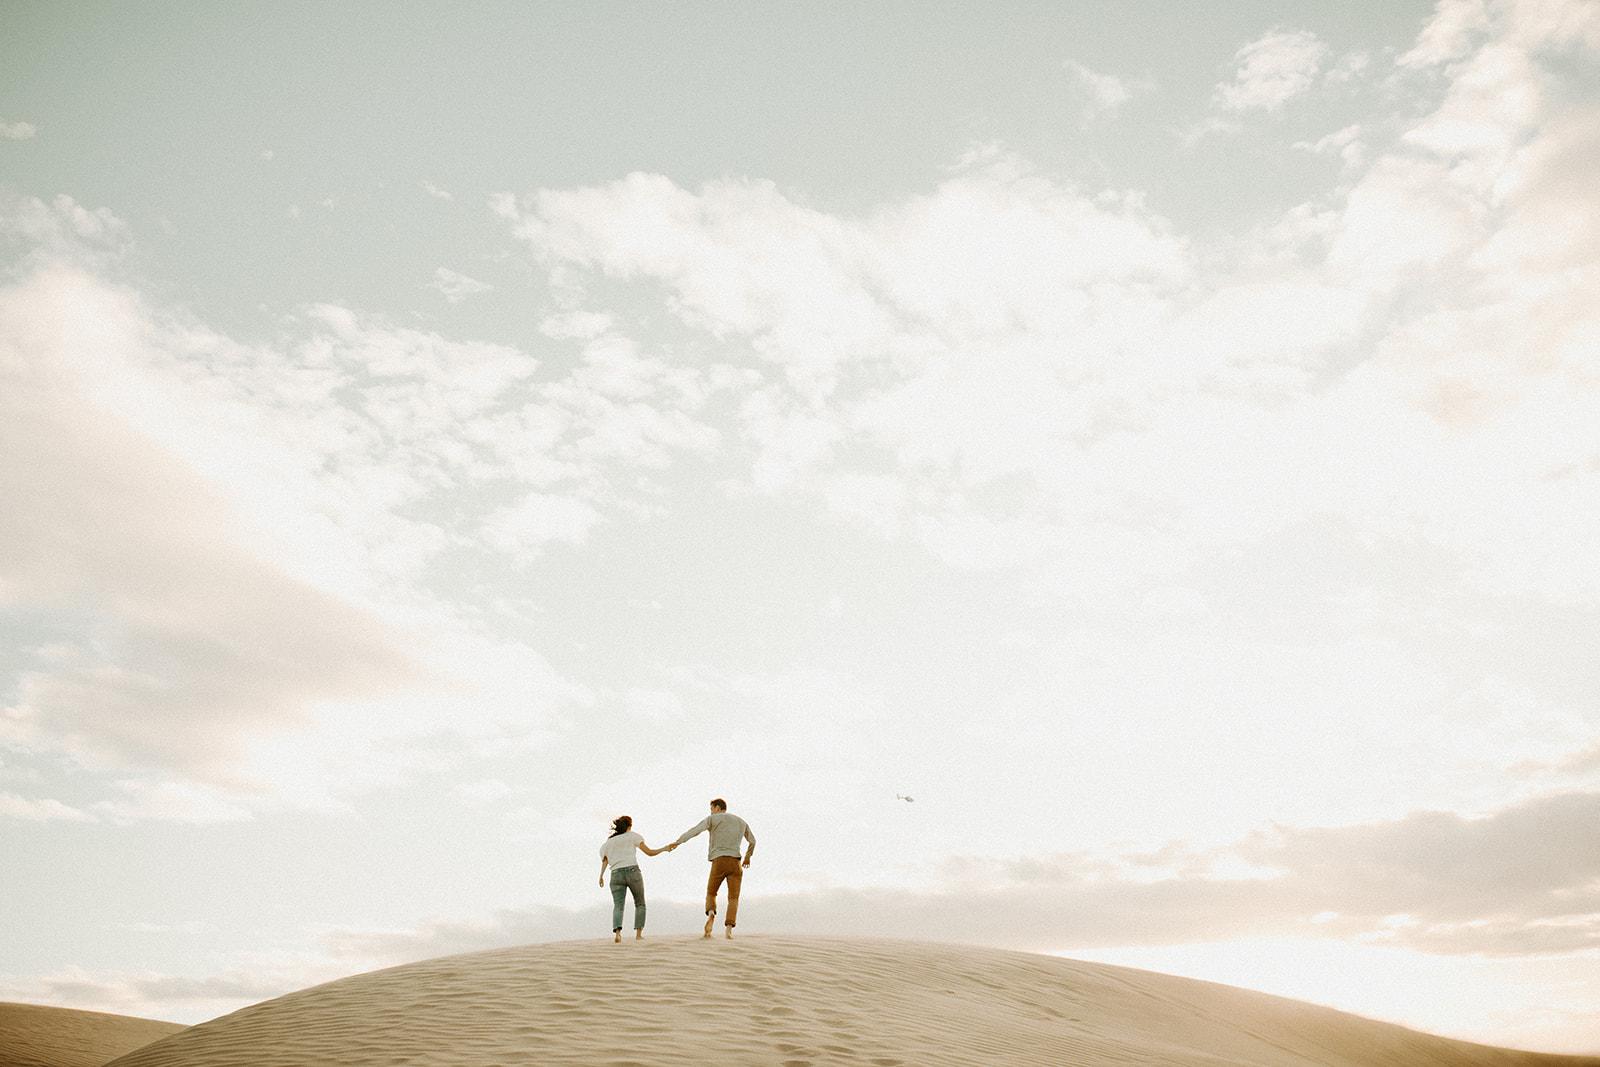 Imperial_Sand_Dunes_Linda_and_Sam_Dawn_Charles_Photographer-7.jpg